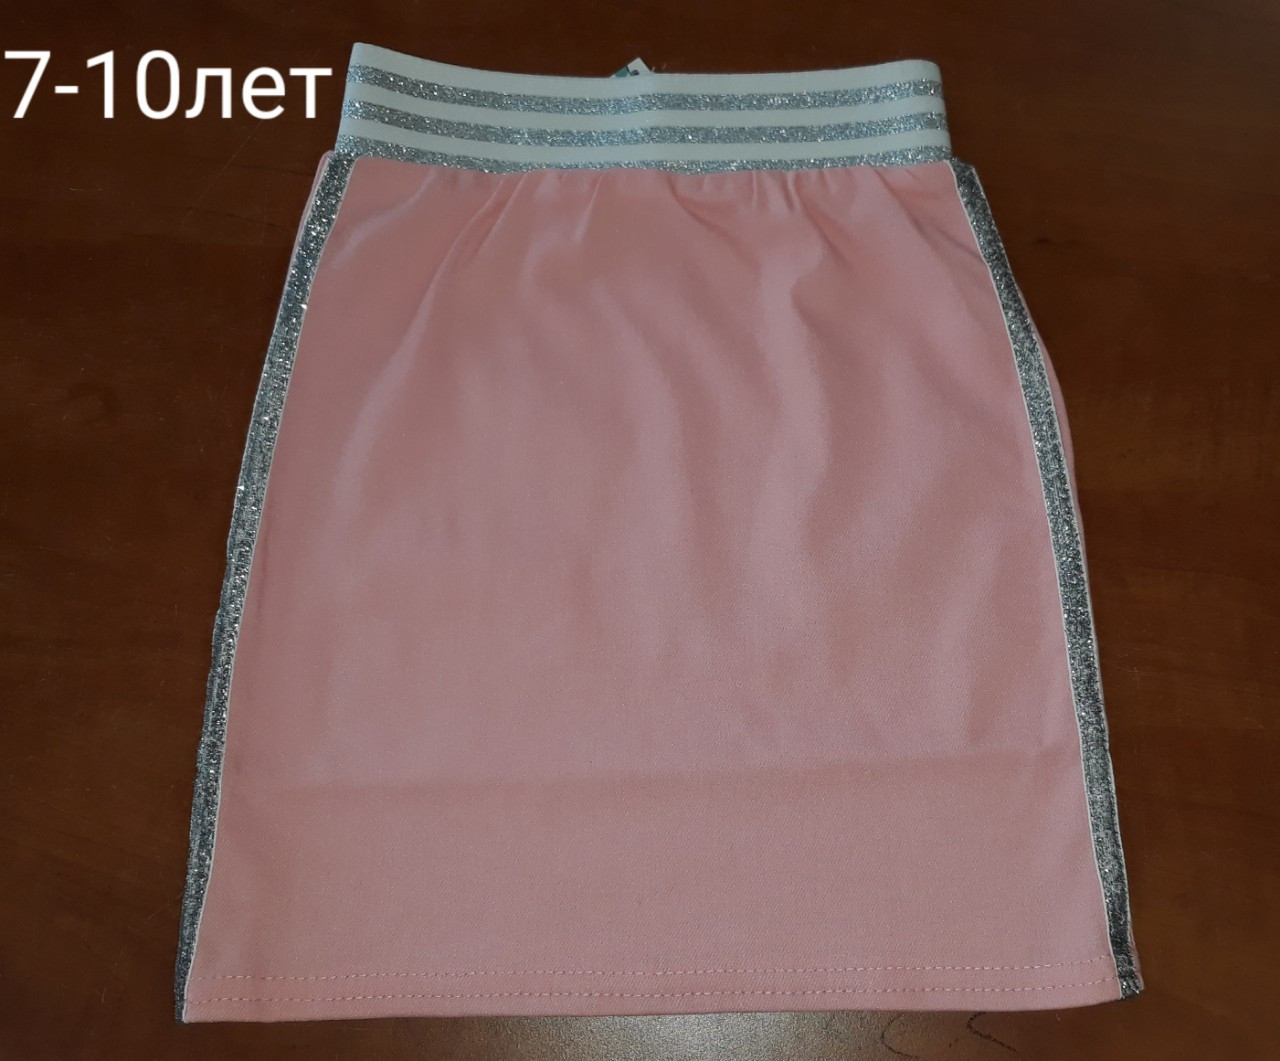 Детская юбка-карандаш для девочки 7-10 лет